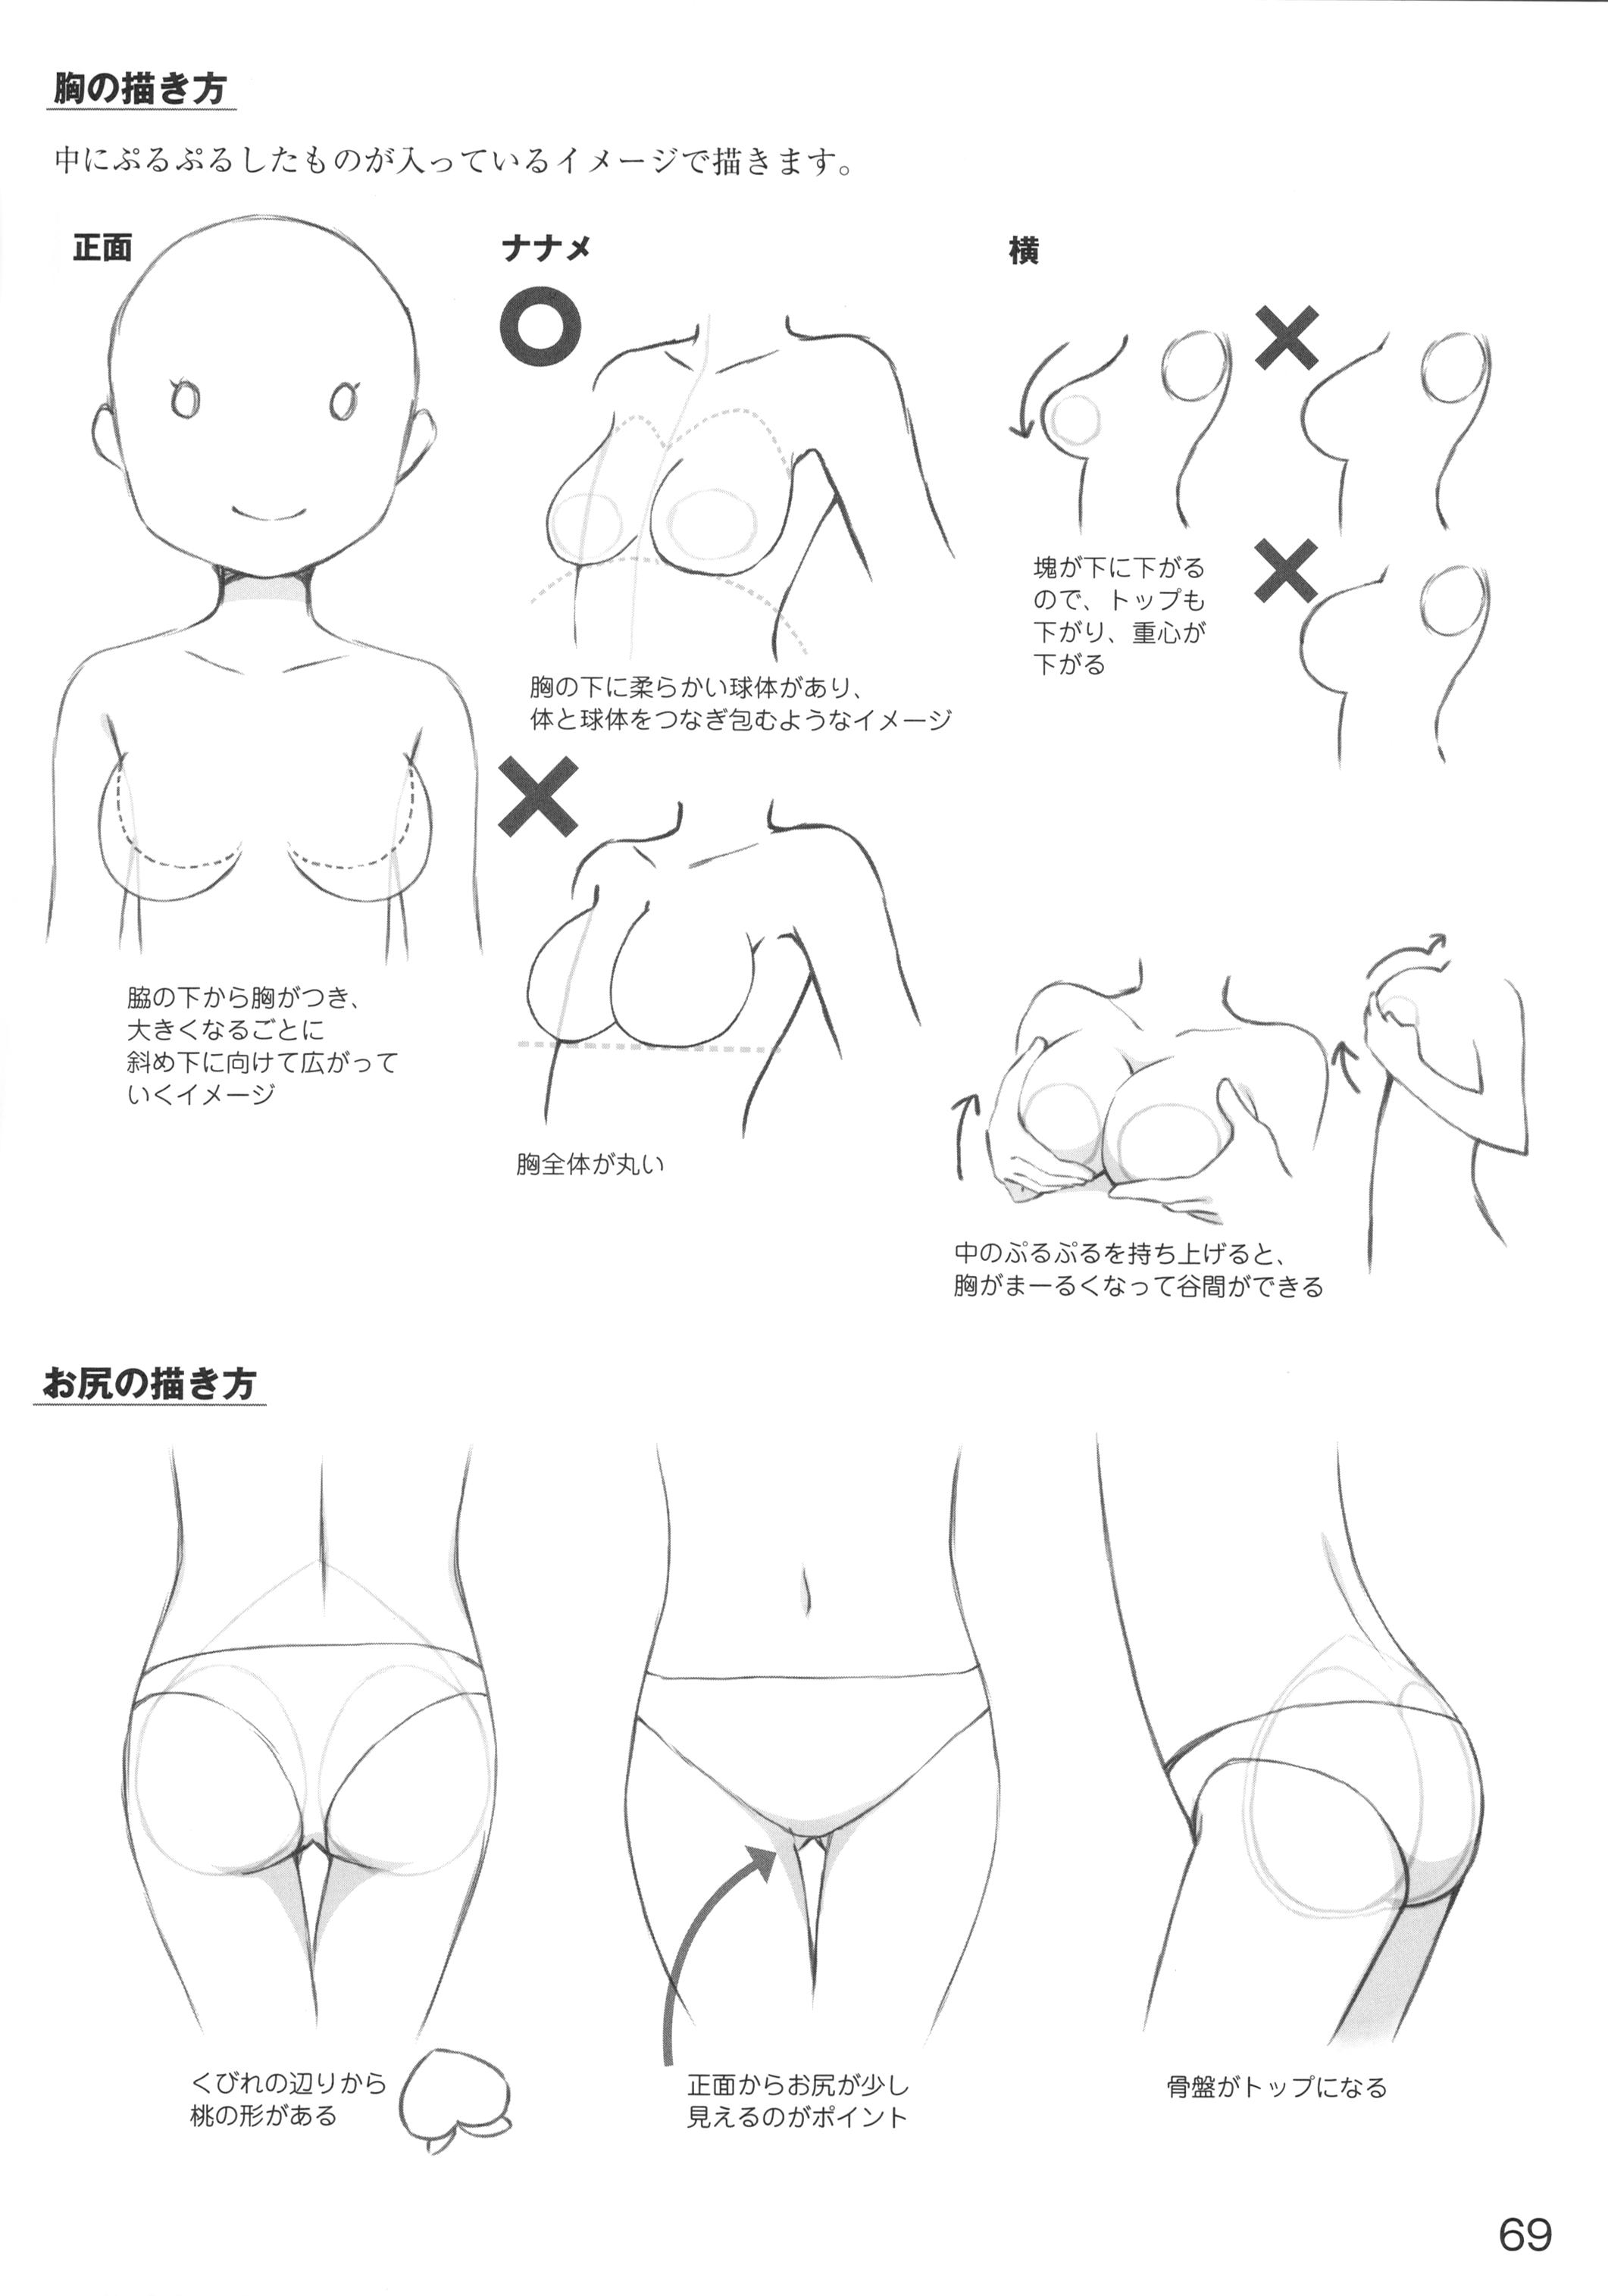 body drawing tutorial anime drawing tutorials art tutorials anime sketch sketch art anatomy reference drawing reference anatomy tutorial anime poses